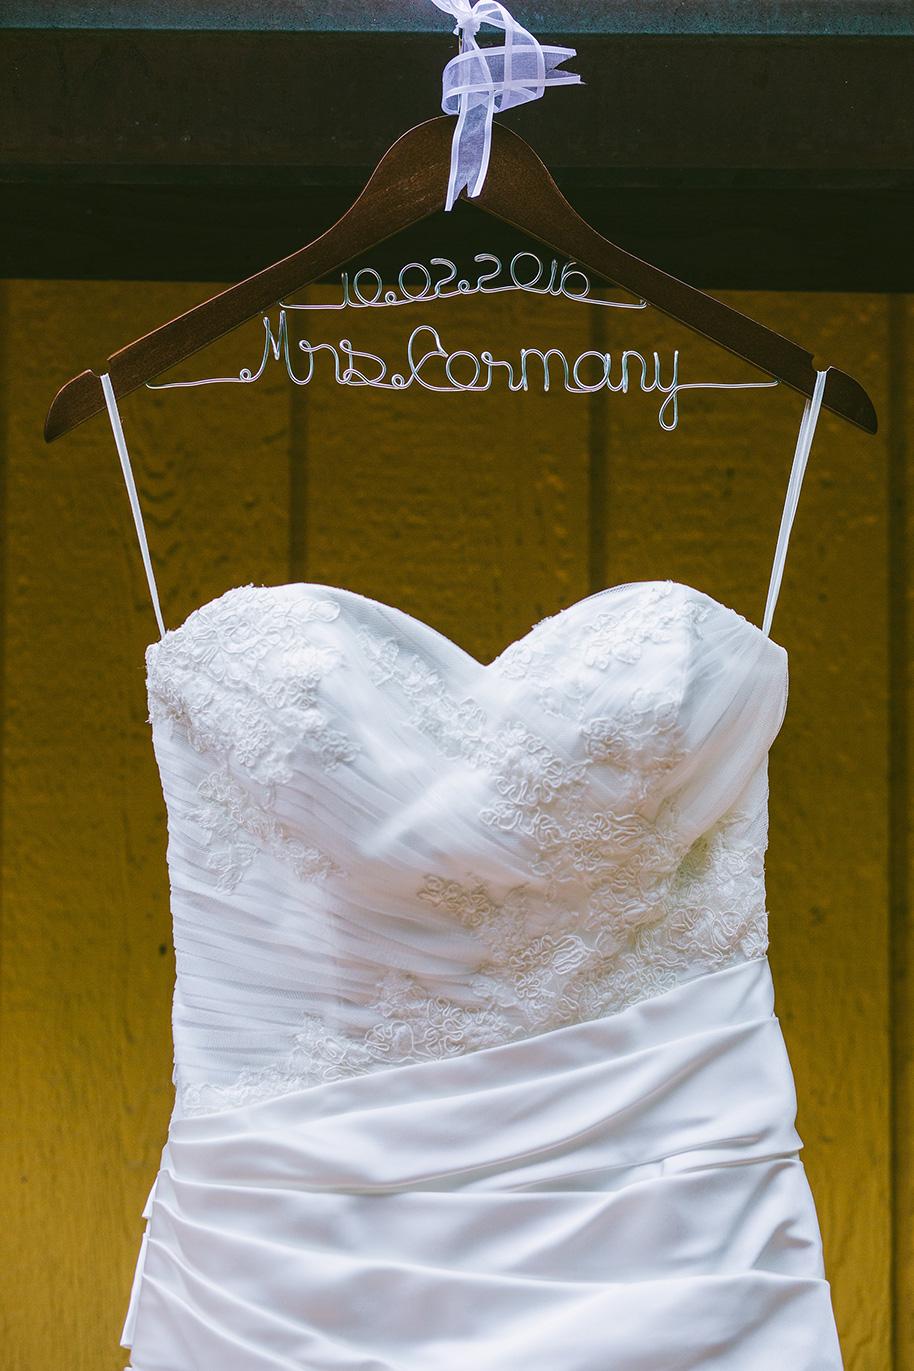 Private-Estate-Wedding-030817-3.jpg